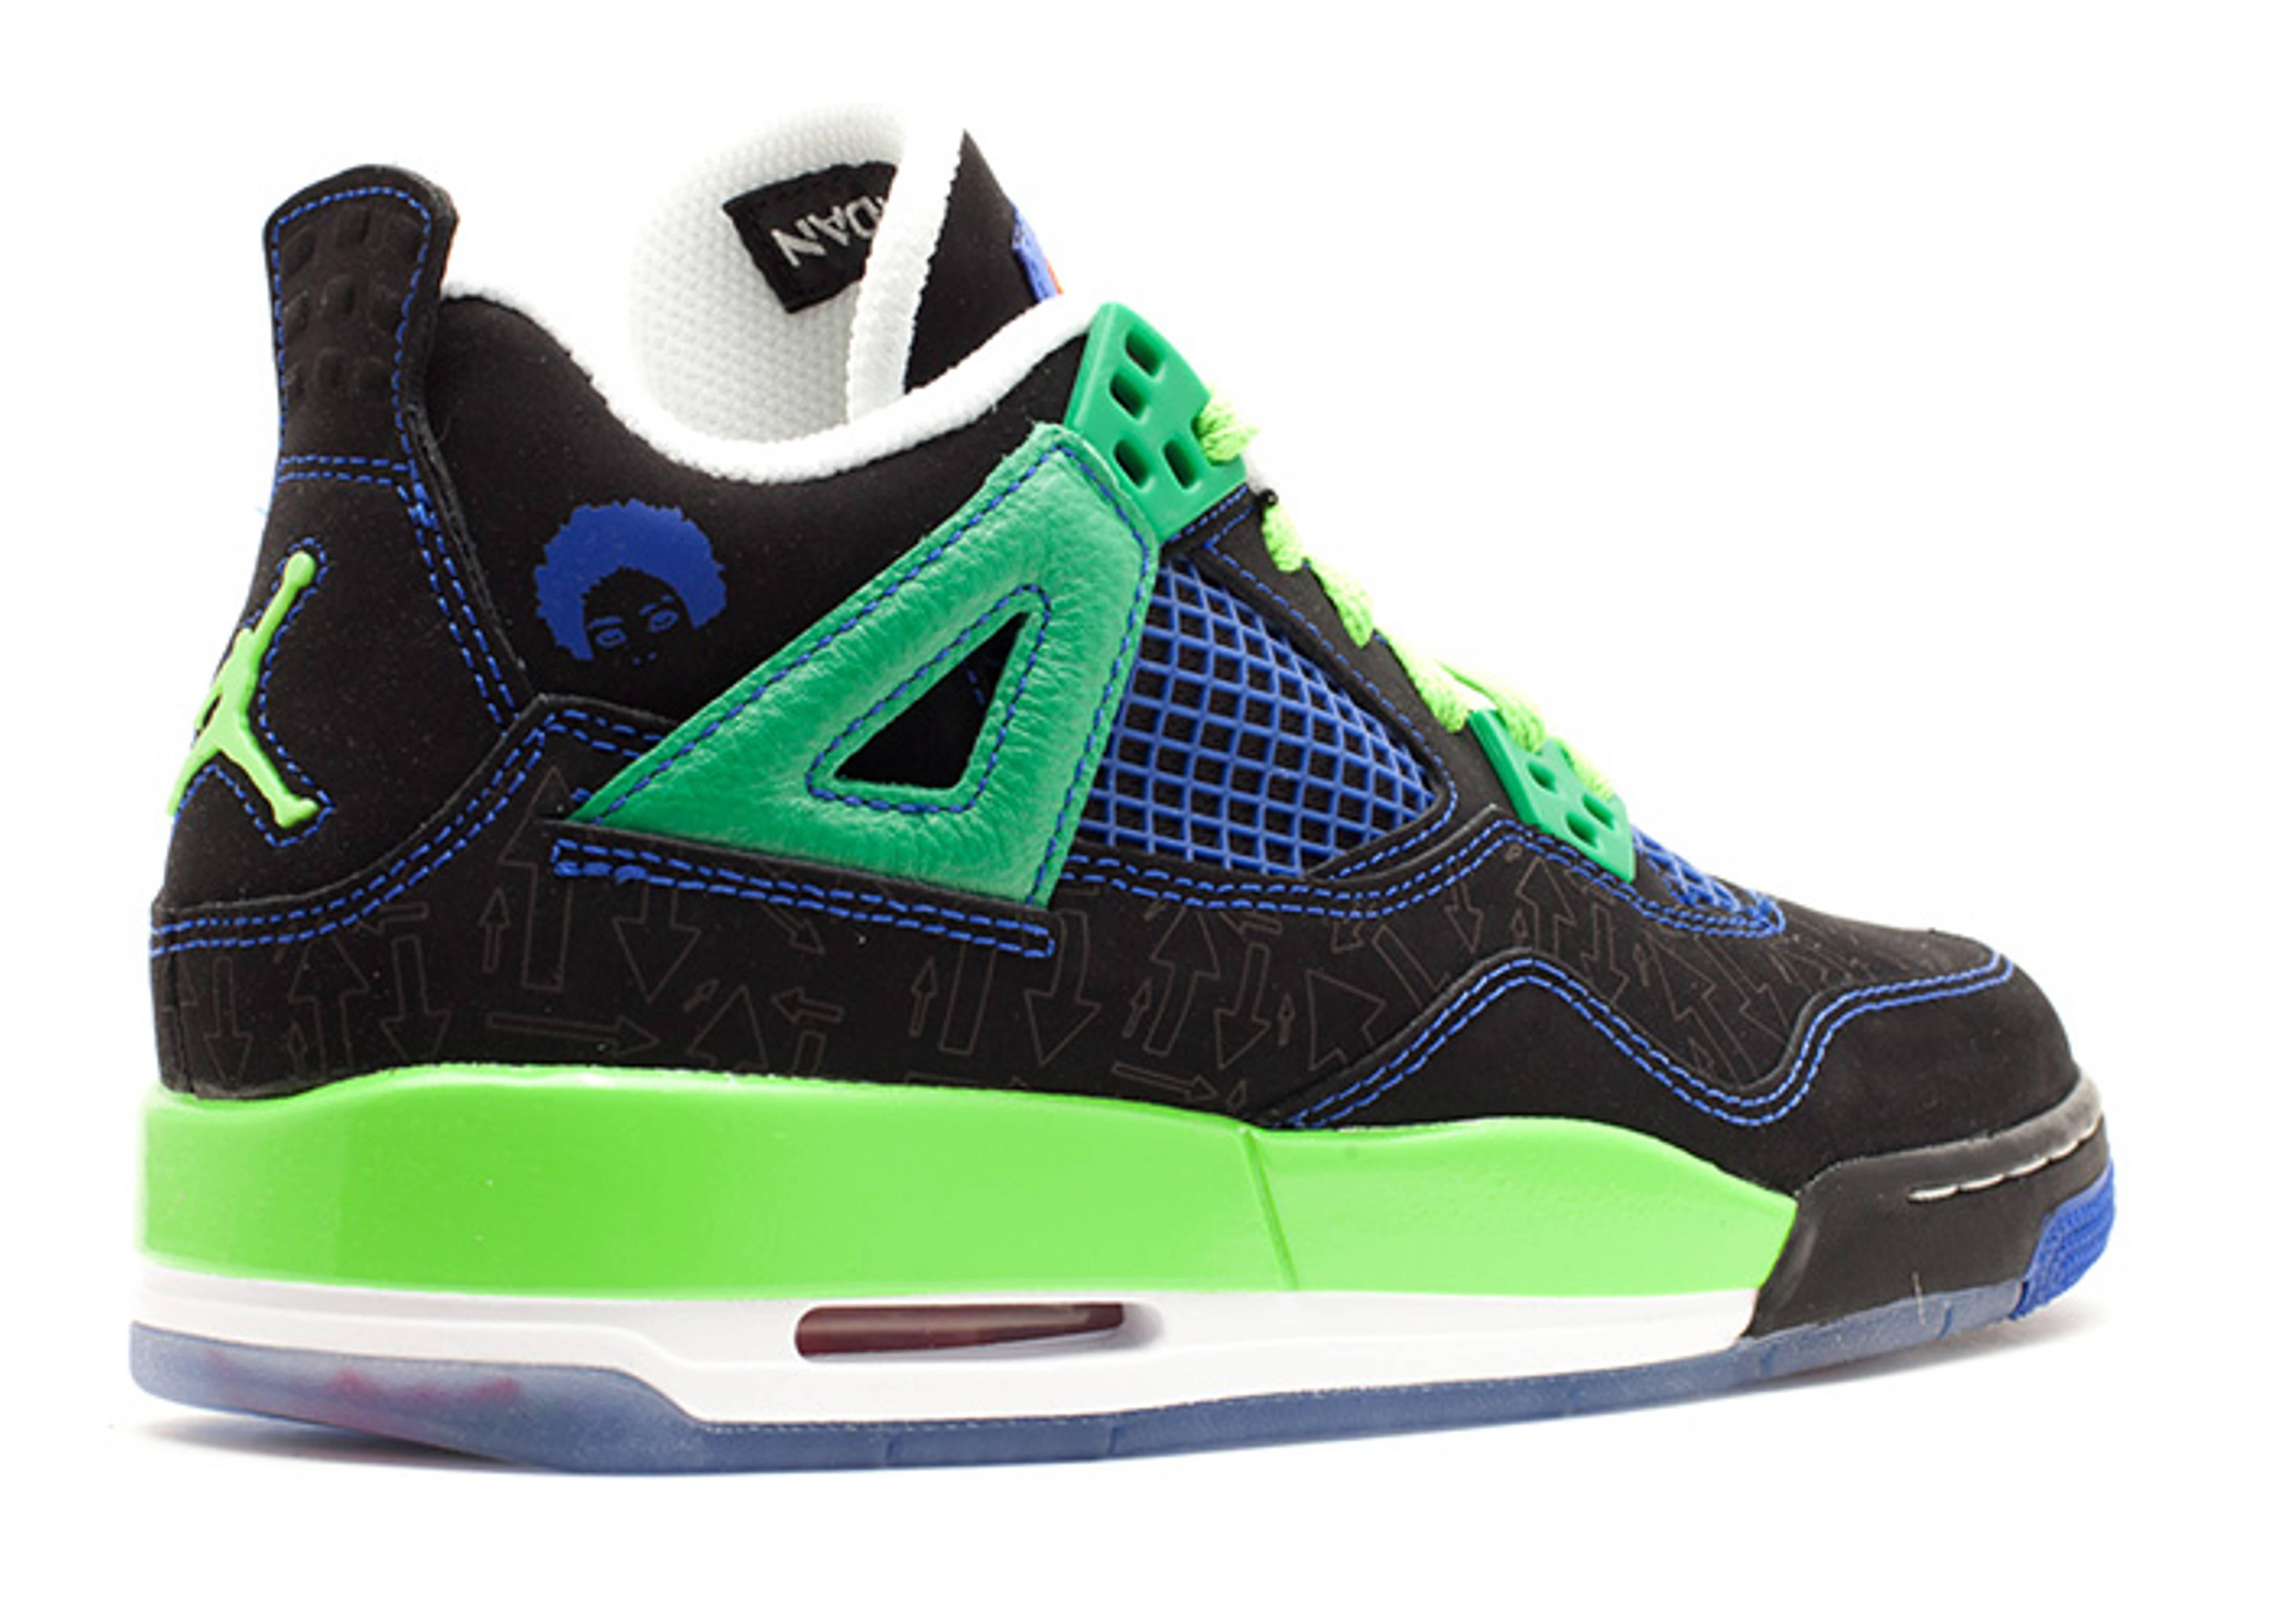 20435476475ff2 ... Air Jordan 4 Retro Db (gs) ... Air Jordan 4 Retro Doernbecher Superman  Black Old Royal-Electric Green- ...